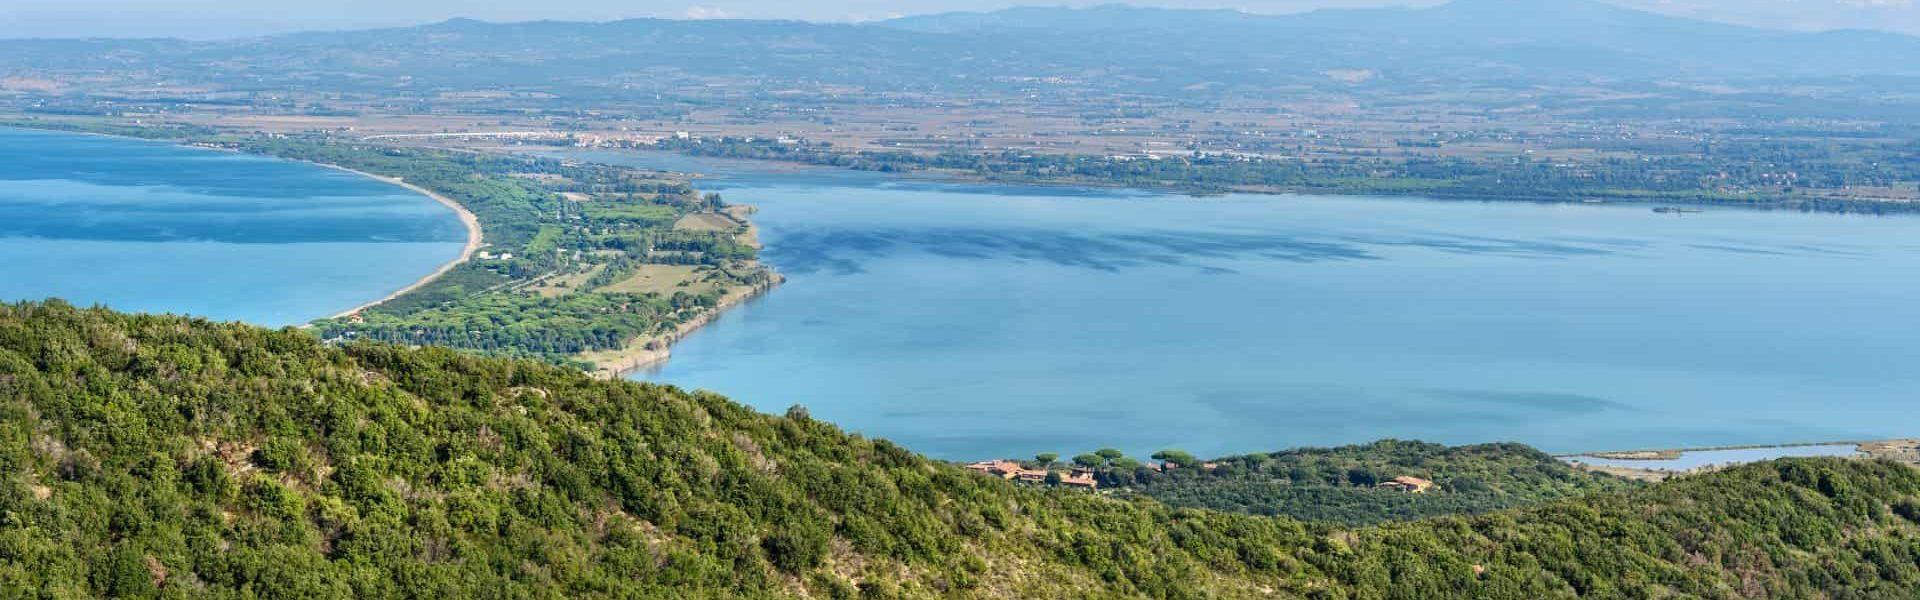 View of Tombolo della Giannella in lagoon Orbetello on peninsula Argentario. Italy